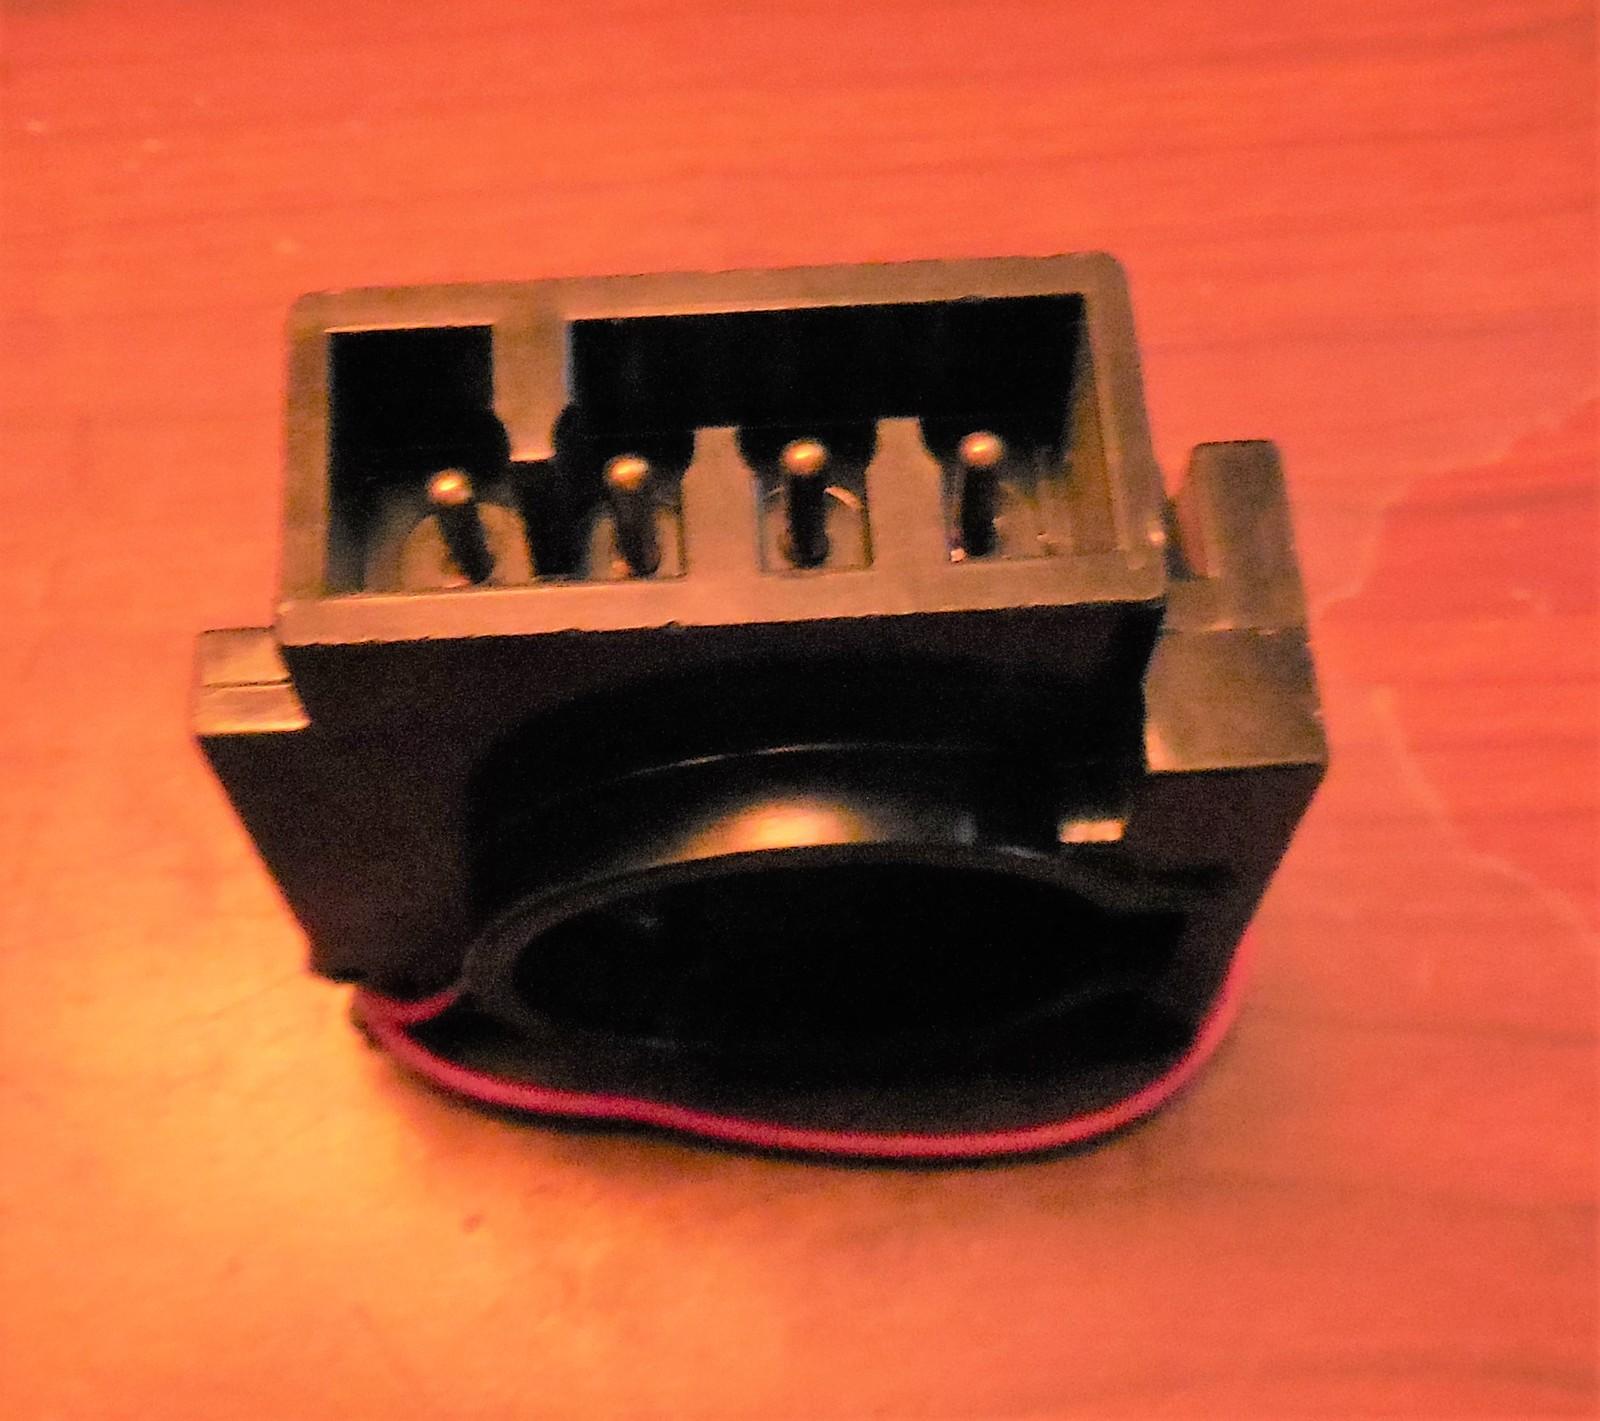 Viking Husqvarna 6690 Electric Plug Harness w/Electronics & Wire Connectors - $20.00